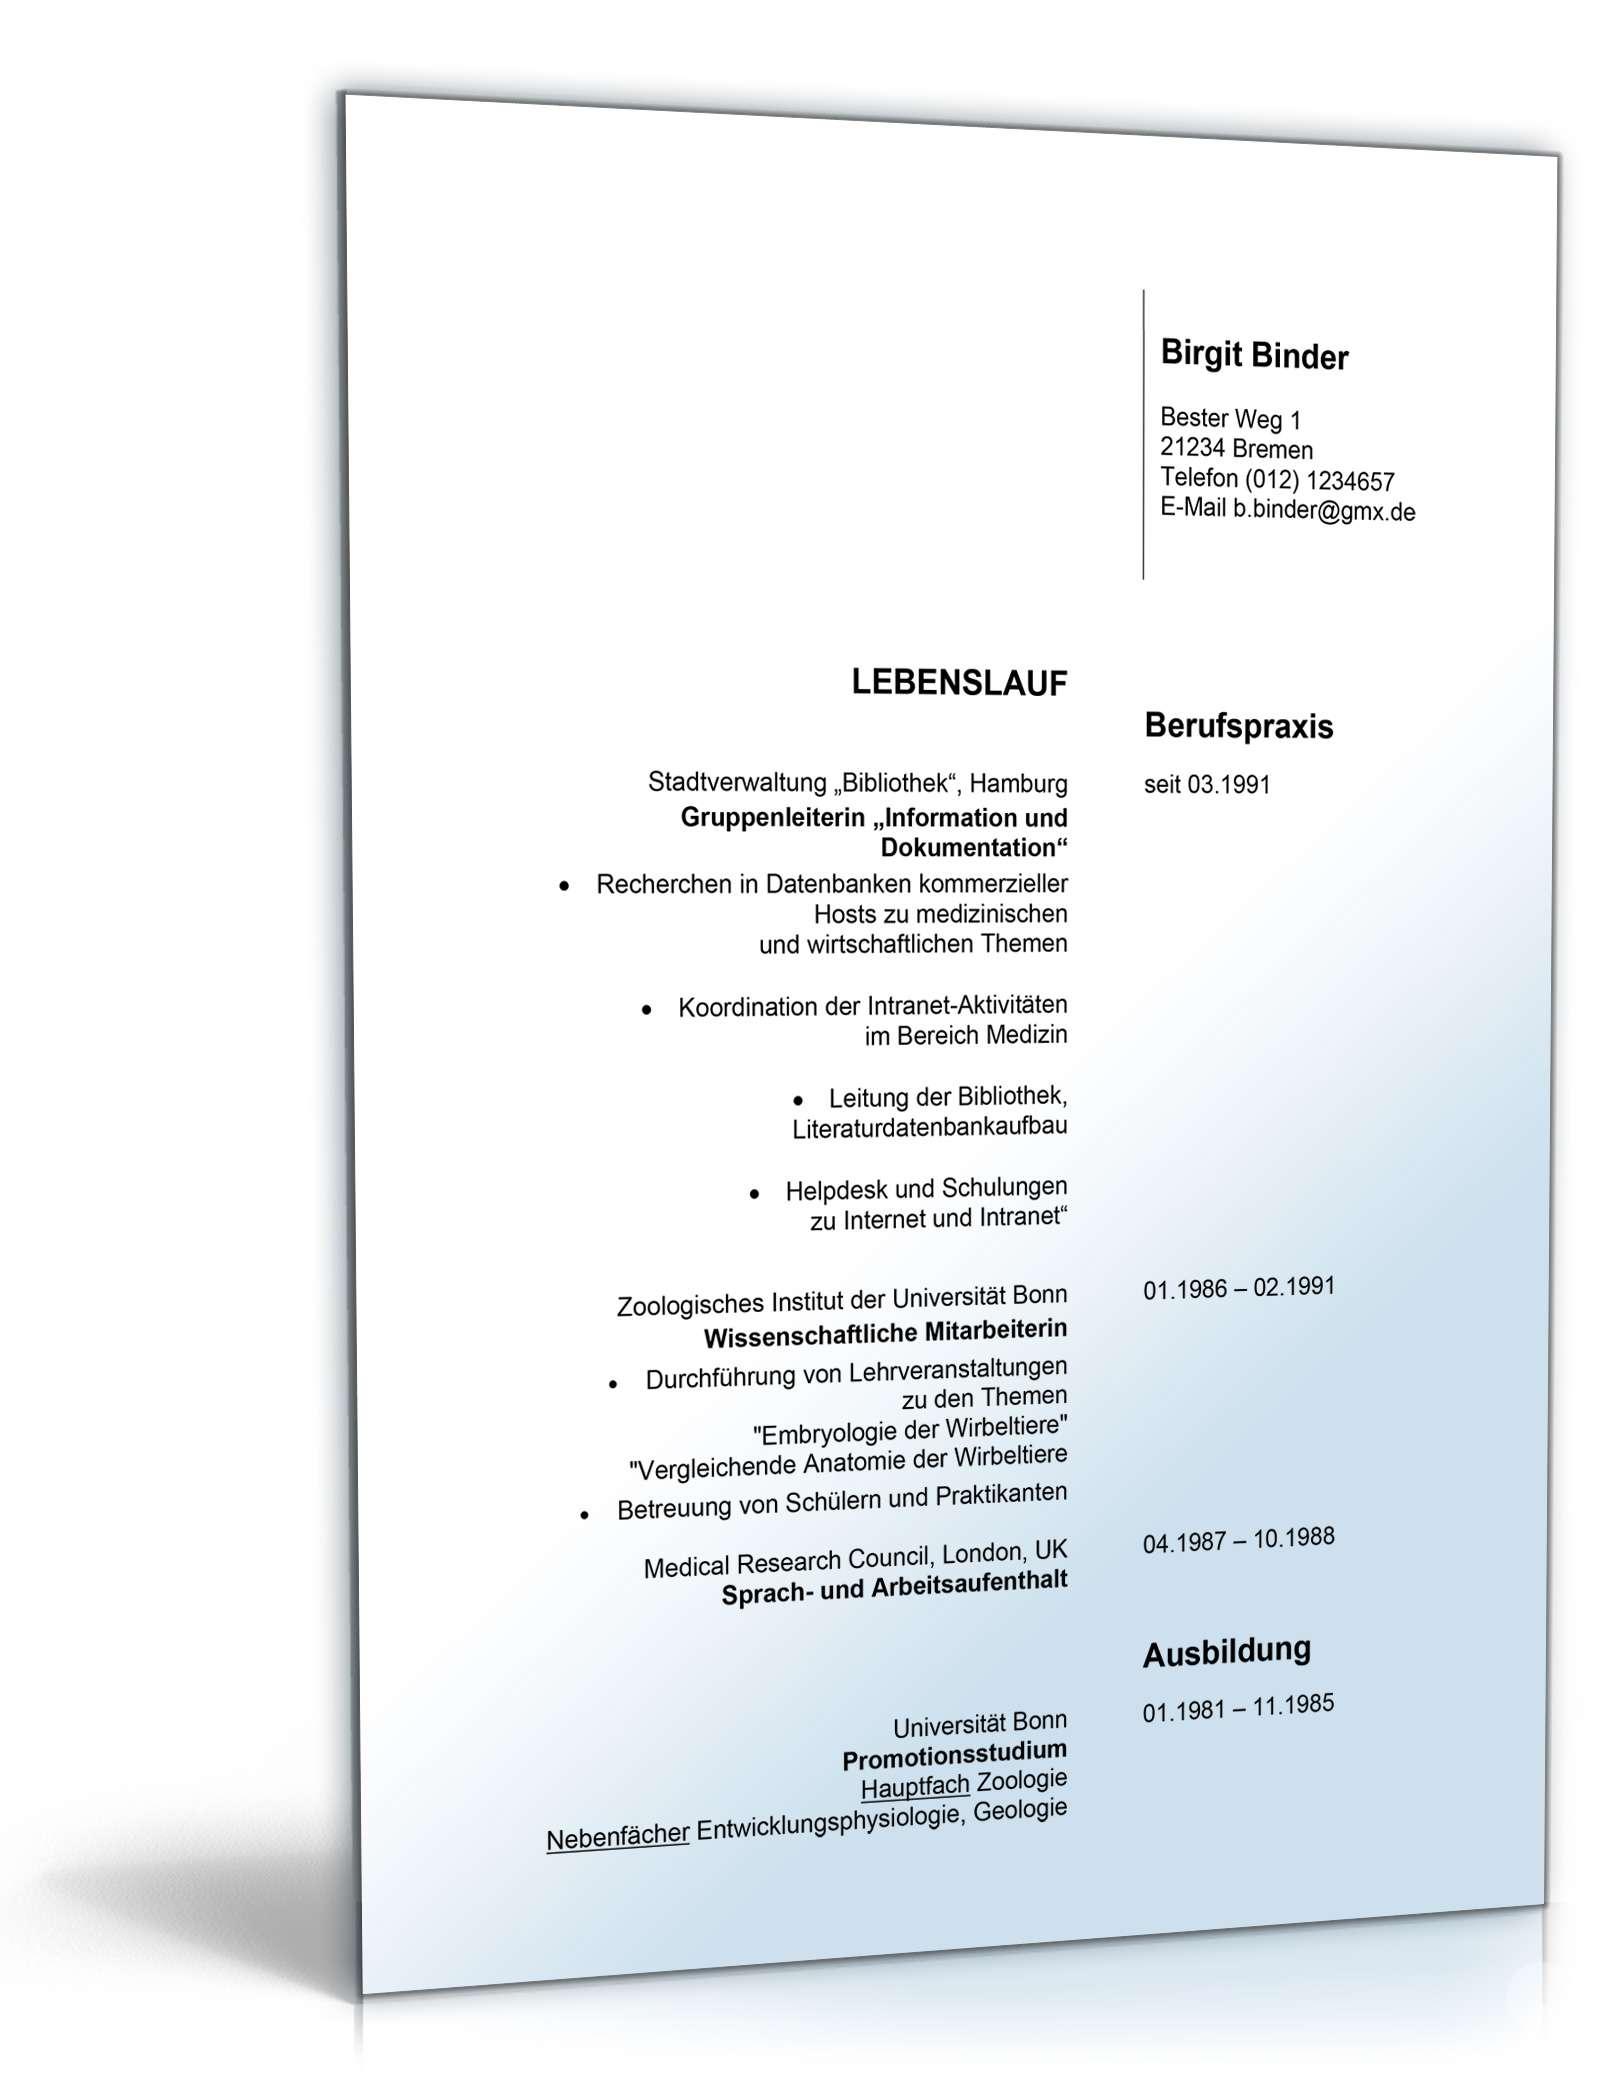 bewerbungs-paket pharmareferent | muster zum download, Einladung